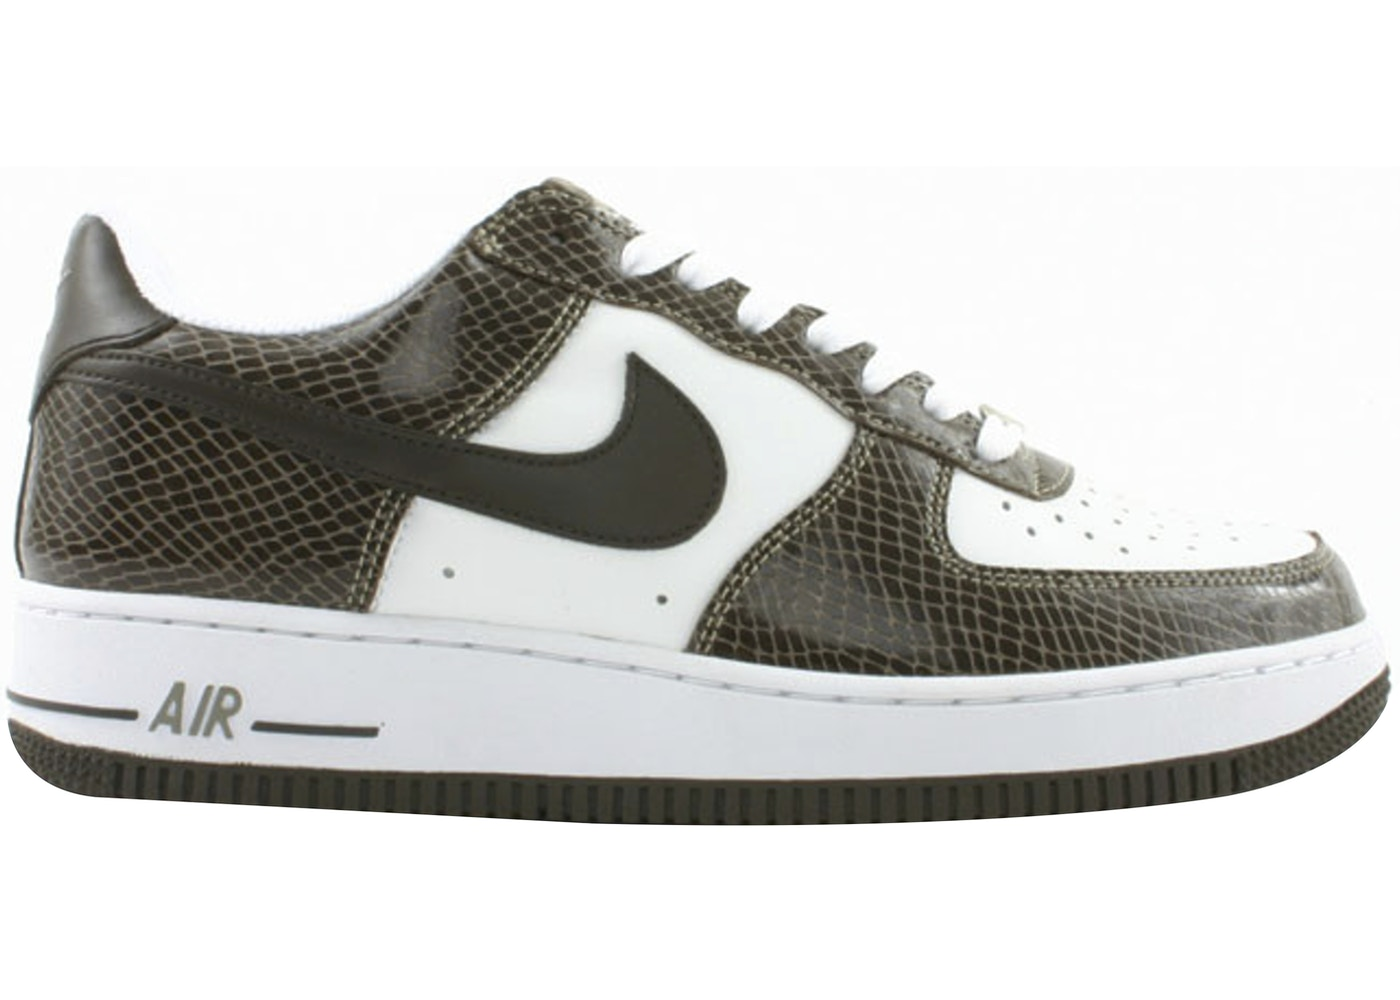 Nike Air Force 1 Low Snakeskin Baroque Brown Sneakers (White/Baroque Brown-Khaki)